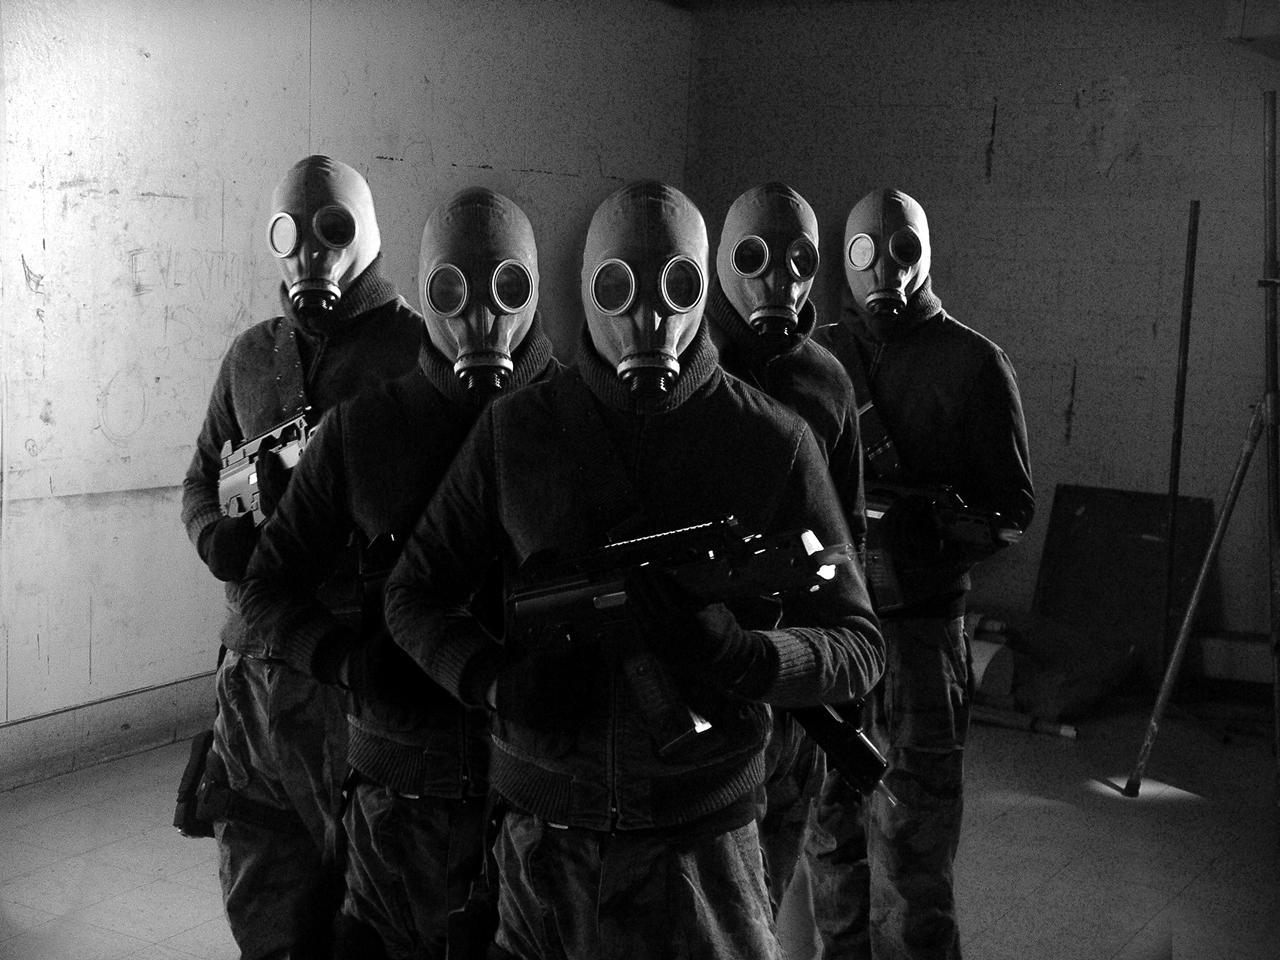 Interrogation Part 2 by nukage